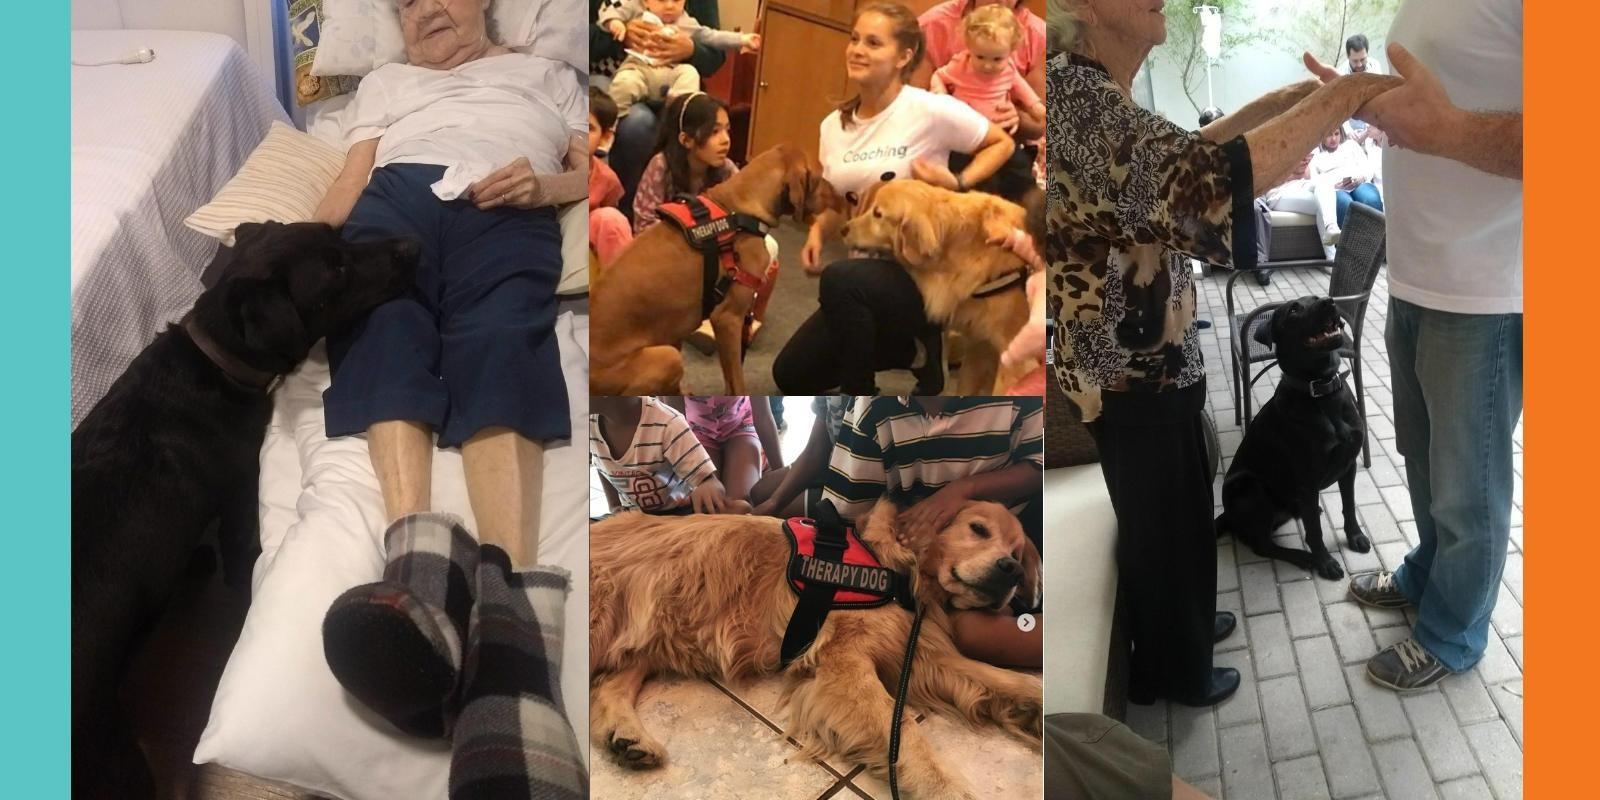 Lambeijos, Carla Ruas - Terapia Assistida por Animais (TAA) e Educação Assistida por Animais (EAA)